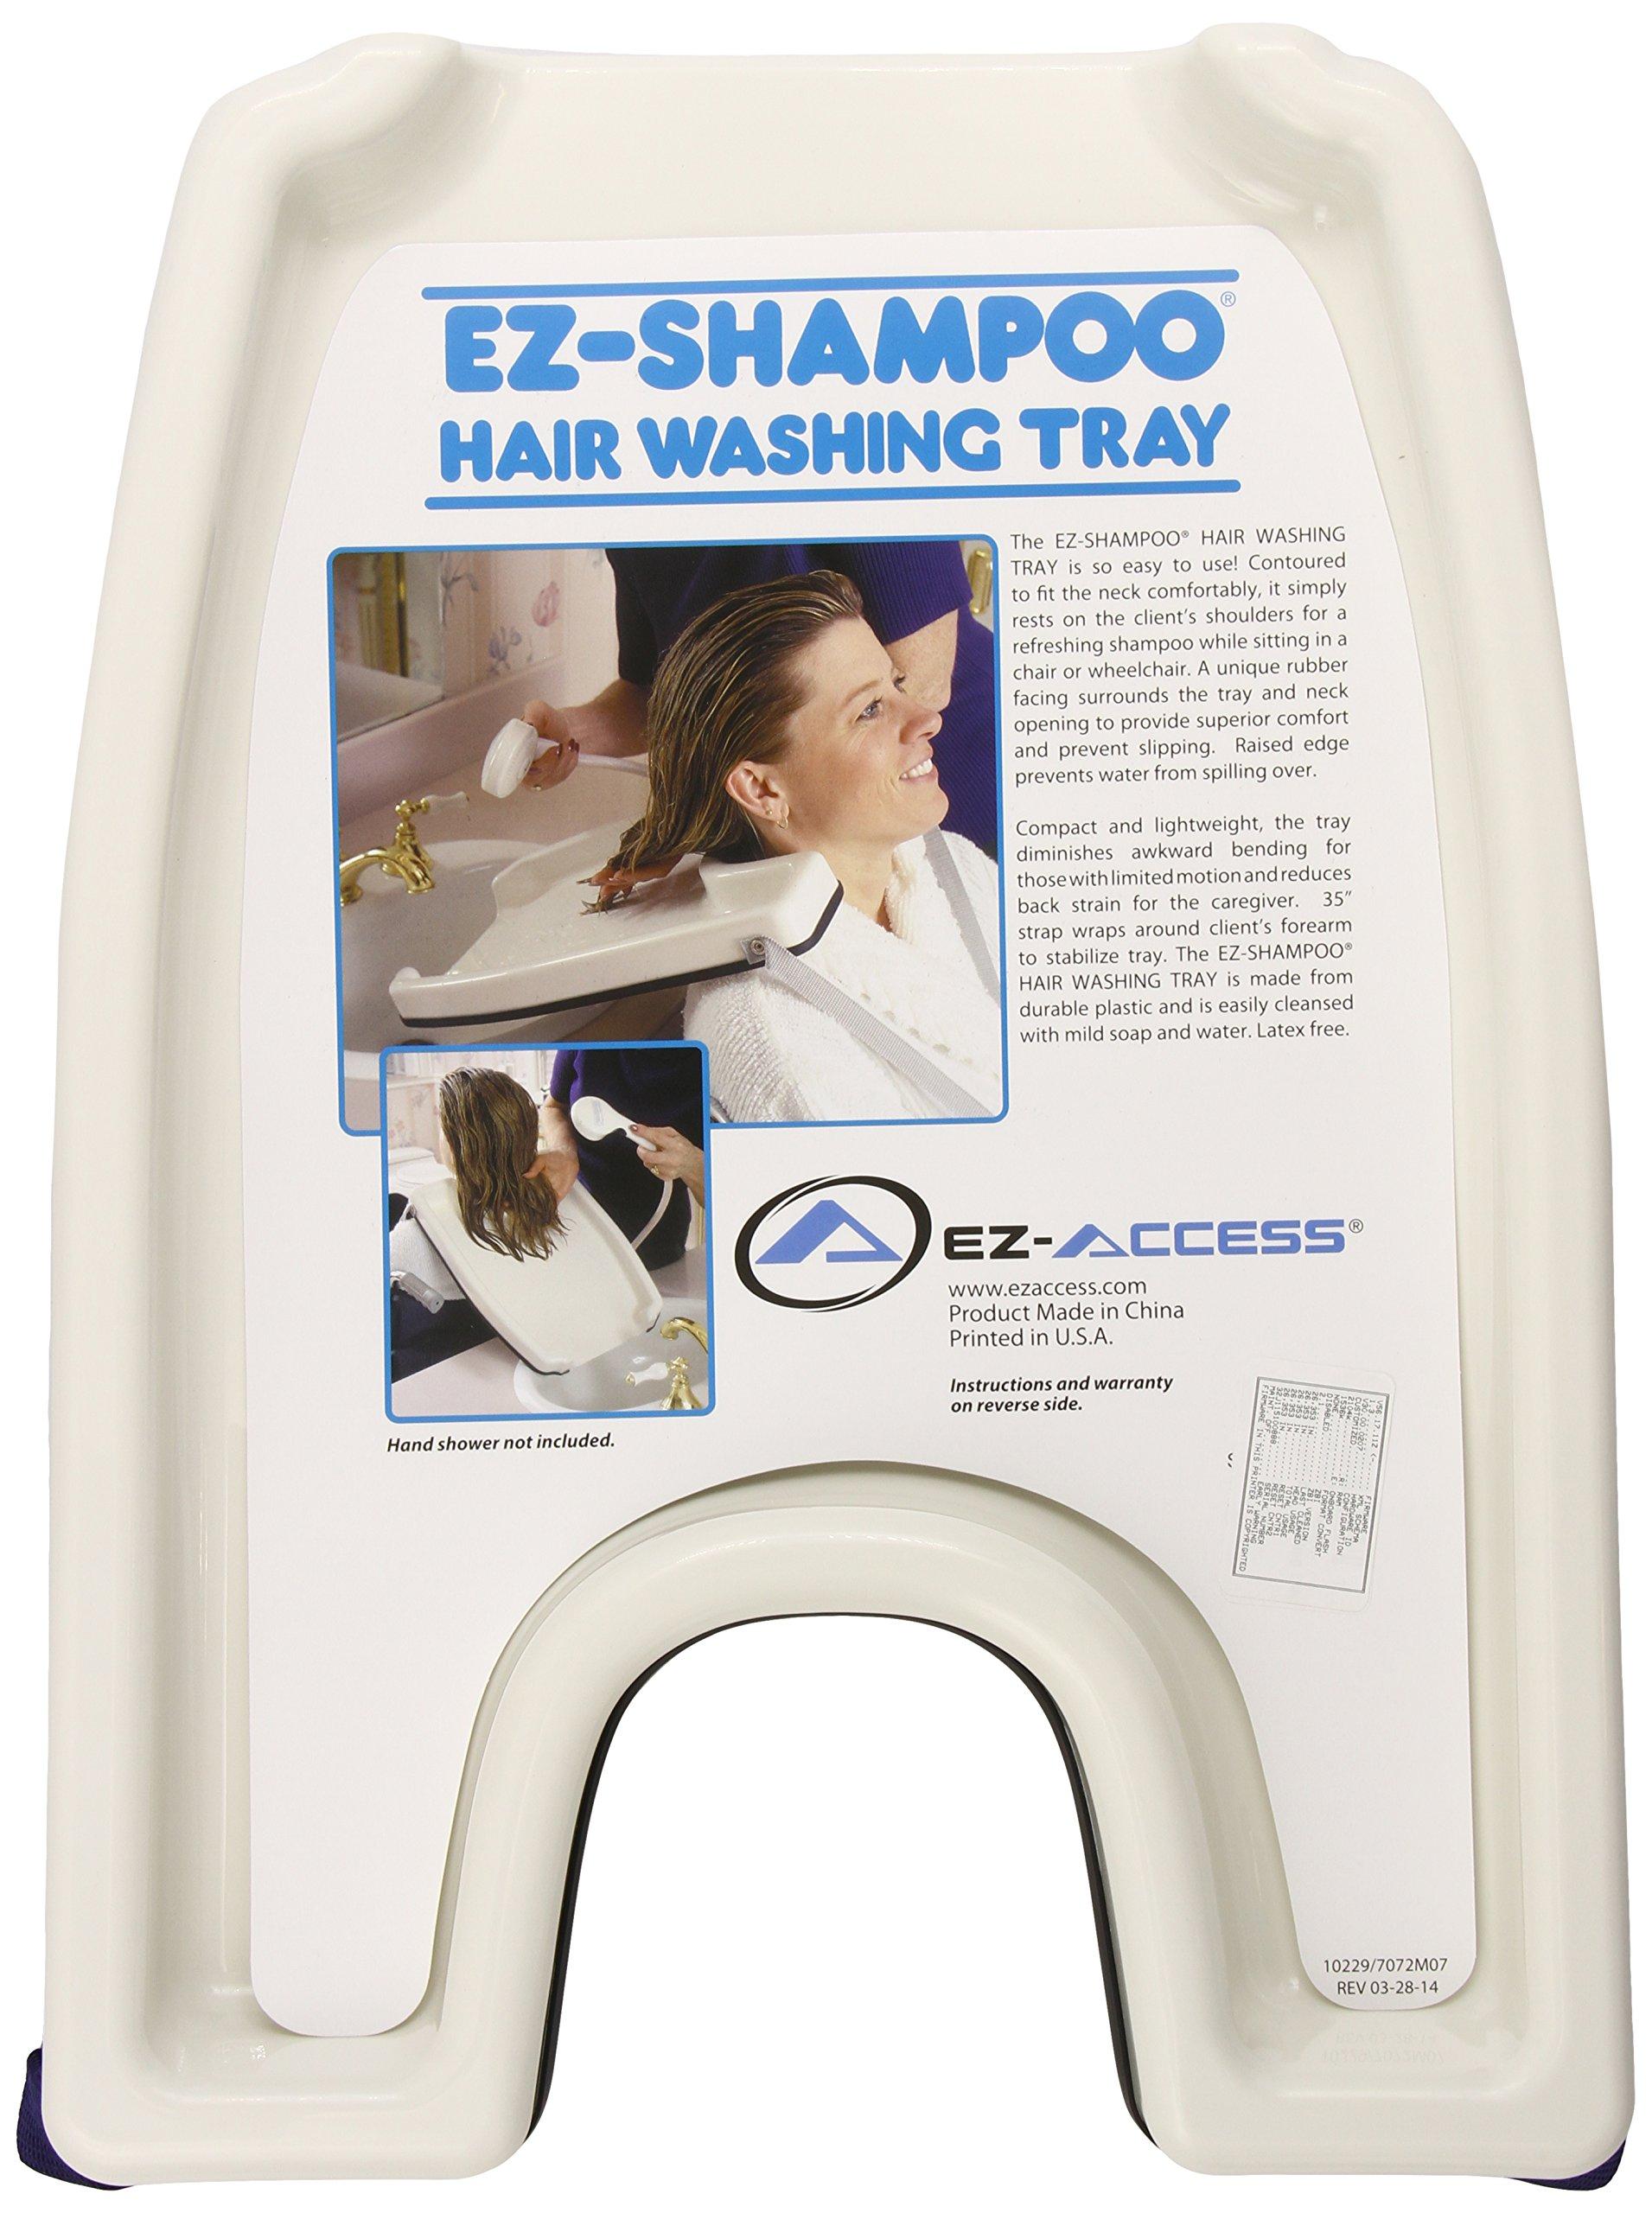 EZ-Shampoo Hair Washing Tray by Home Care